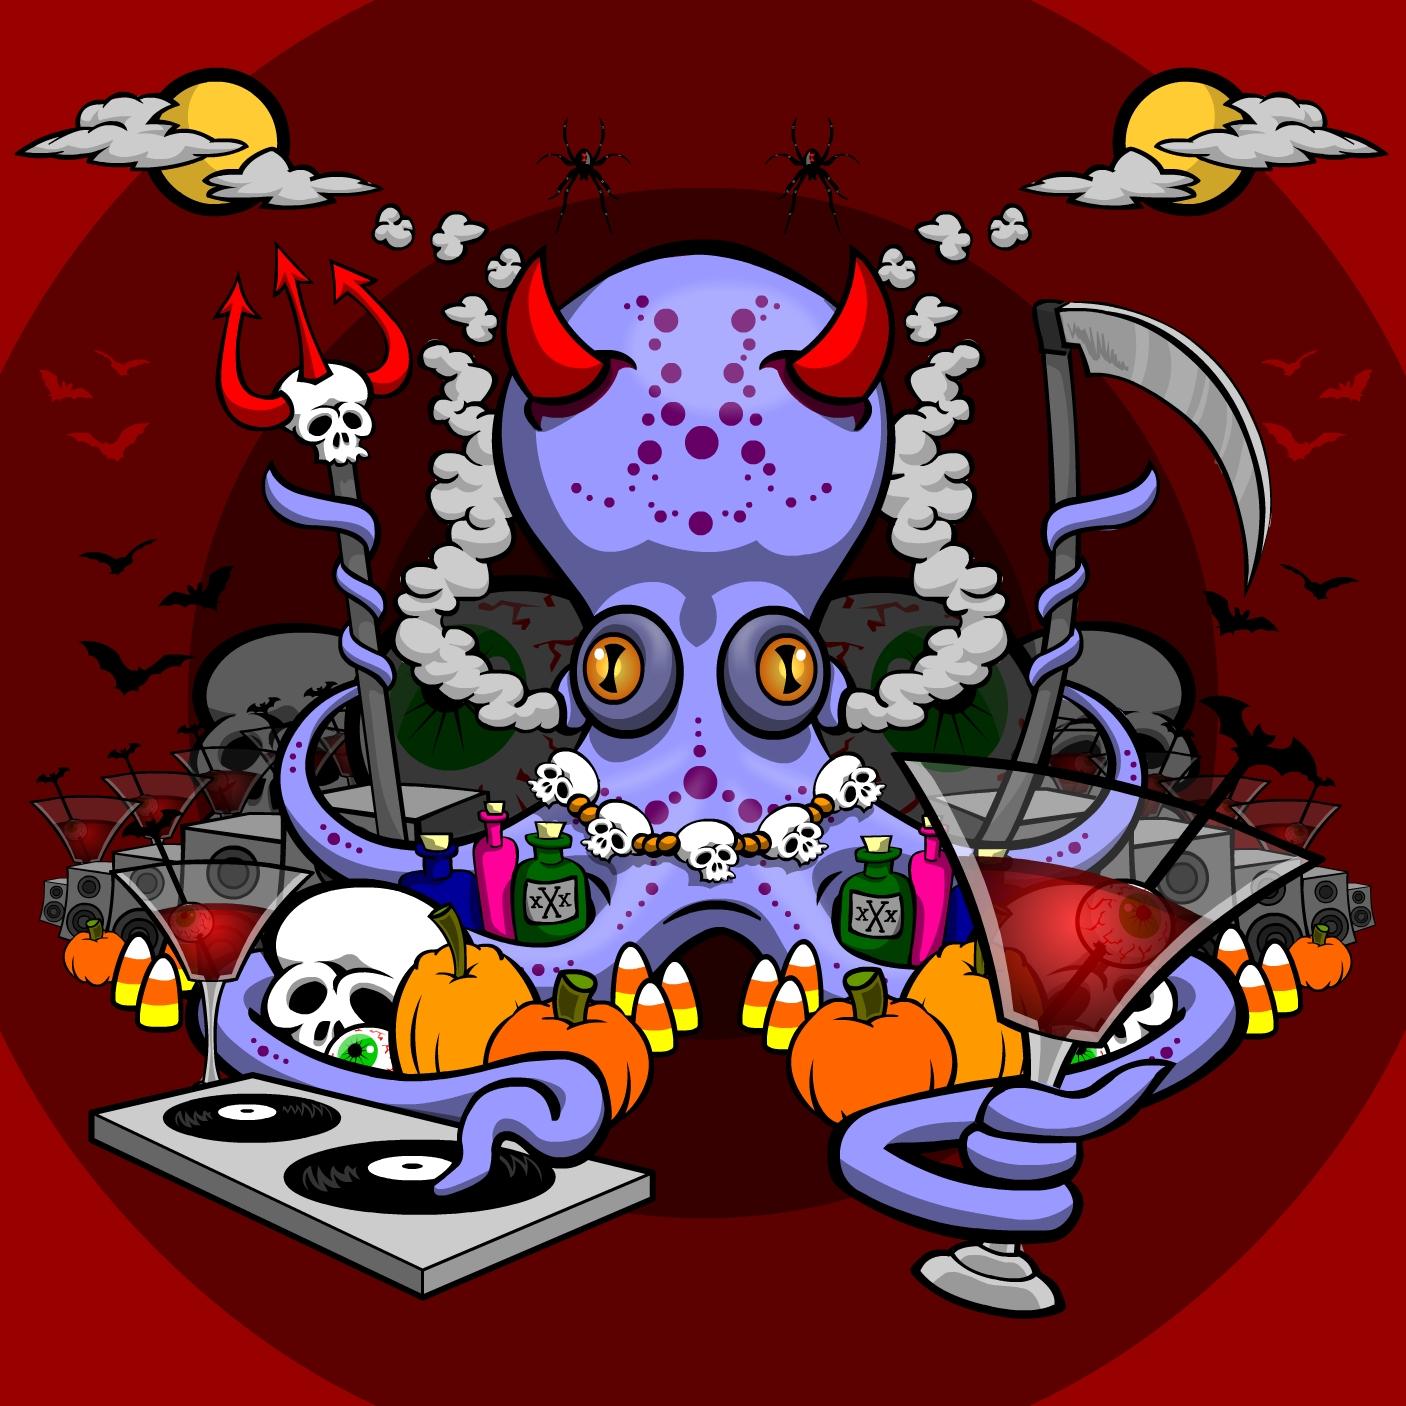 Halloween___09_by_dezignjk.jpg